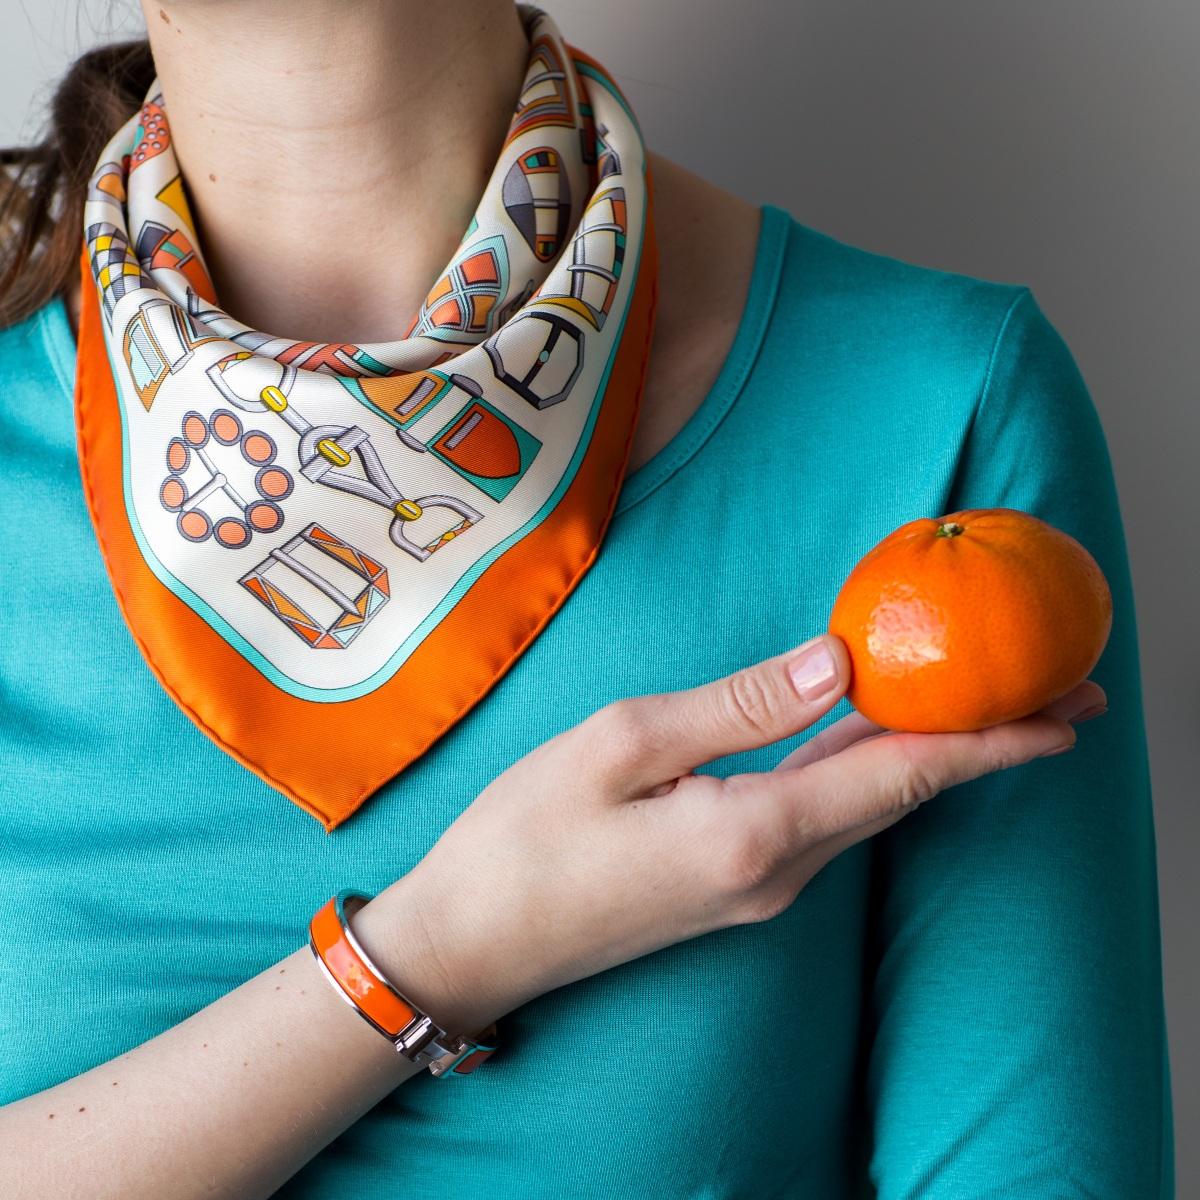 Hermes Clic H, Hermes enamel bracelet, orange, Hermes jewelry, Hermes Clic Clac